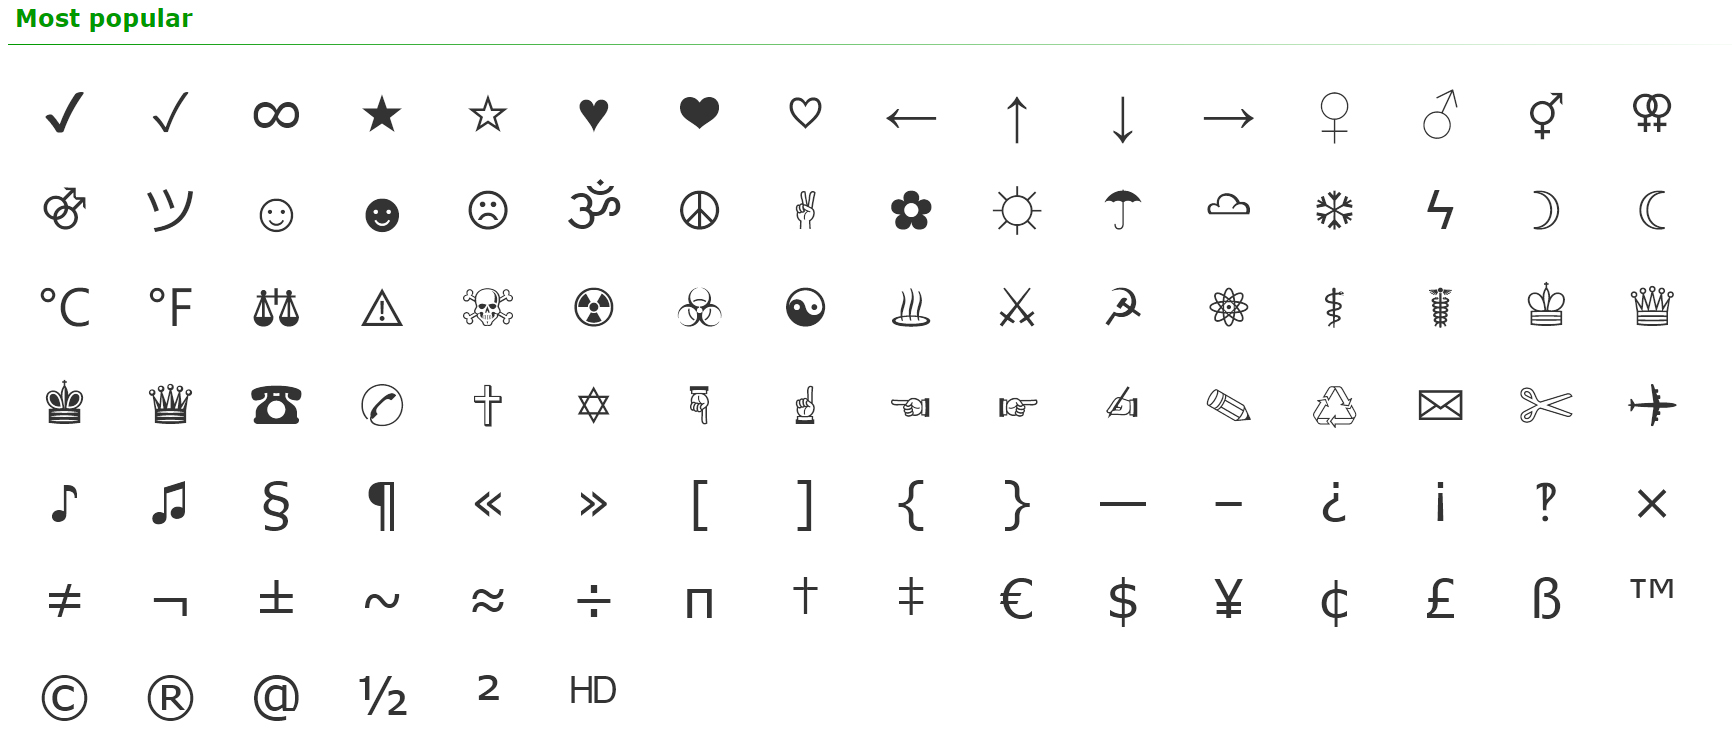 Paste emojis text copy ʕ•́ᴥ•̀ʔっ♡ Cute